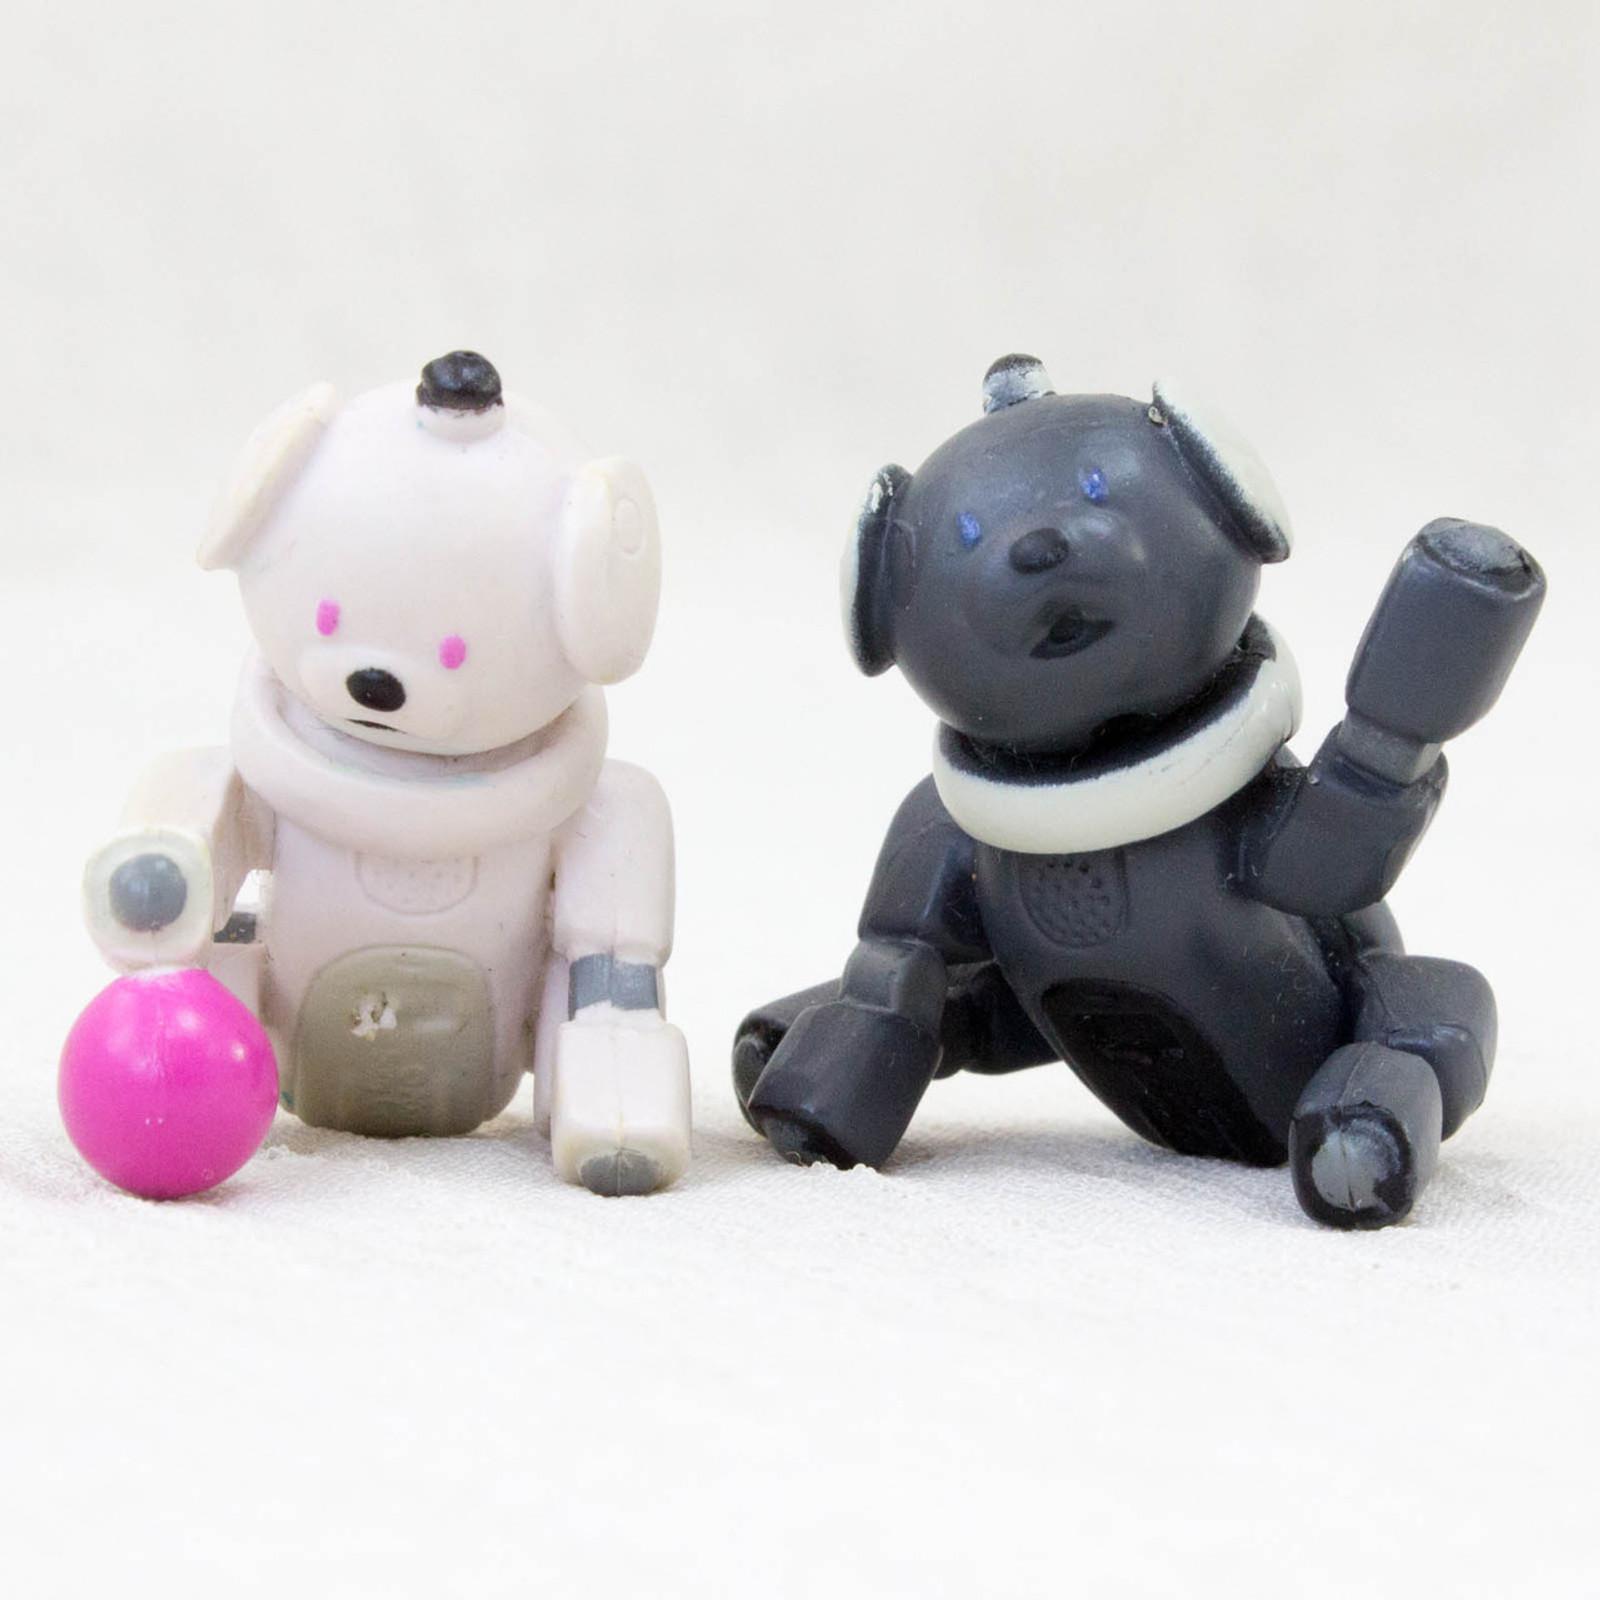 RARE!! AIBO ERS-311 LATTE 312 MACARON Petit Figure Mascot JAPAN SONY